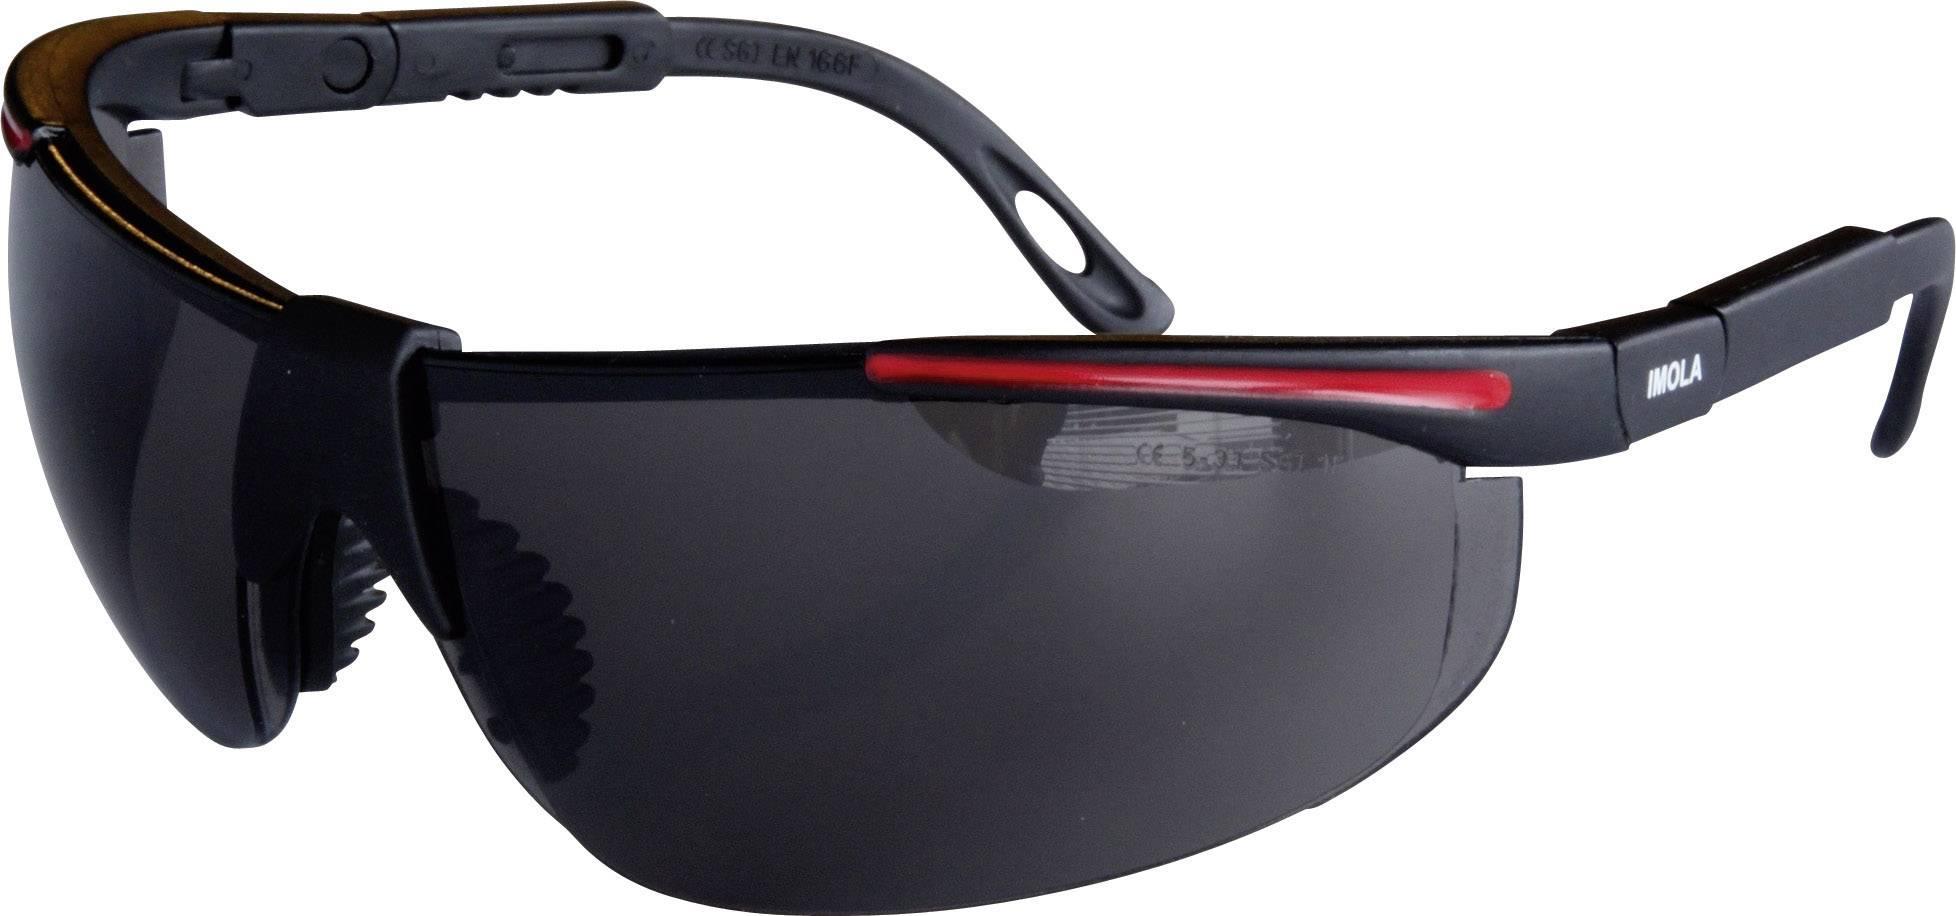 Ochranné okuliare protectionworld 2012009